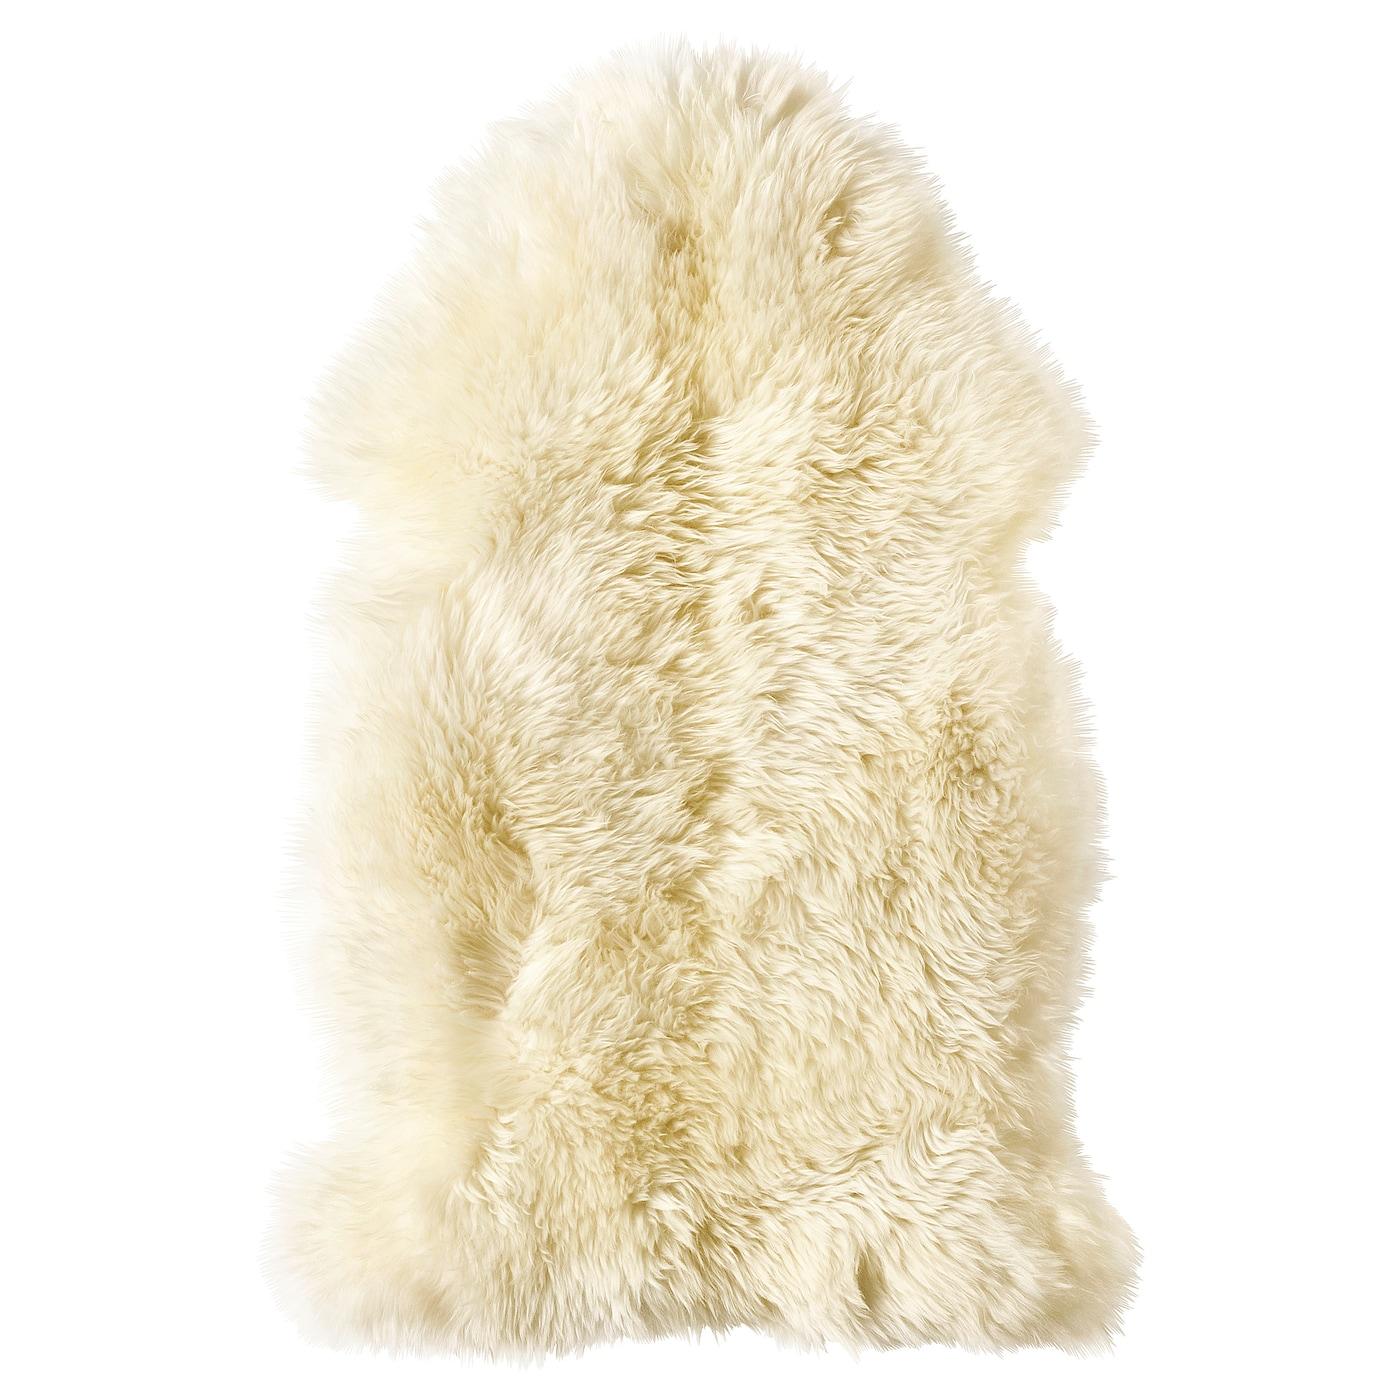 100 Incroyable Idées Peau De Mouton Ikea